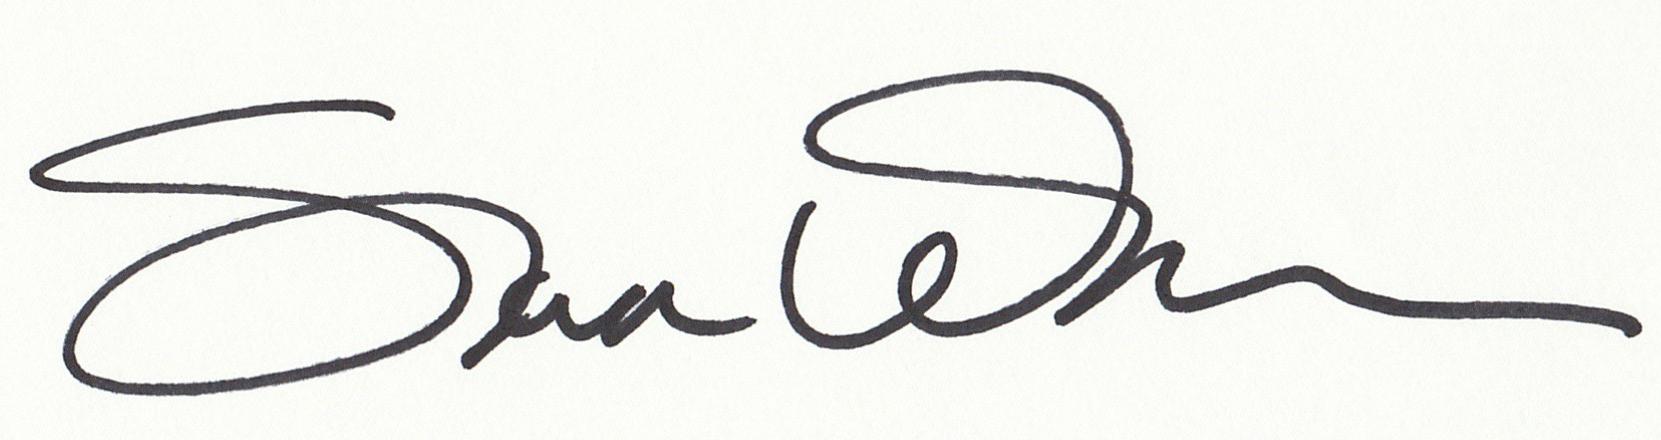 Sondra Wampler Signature